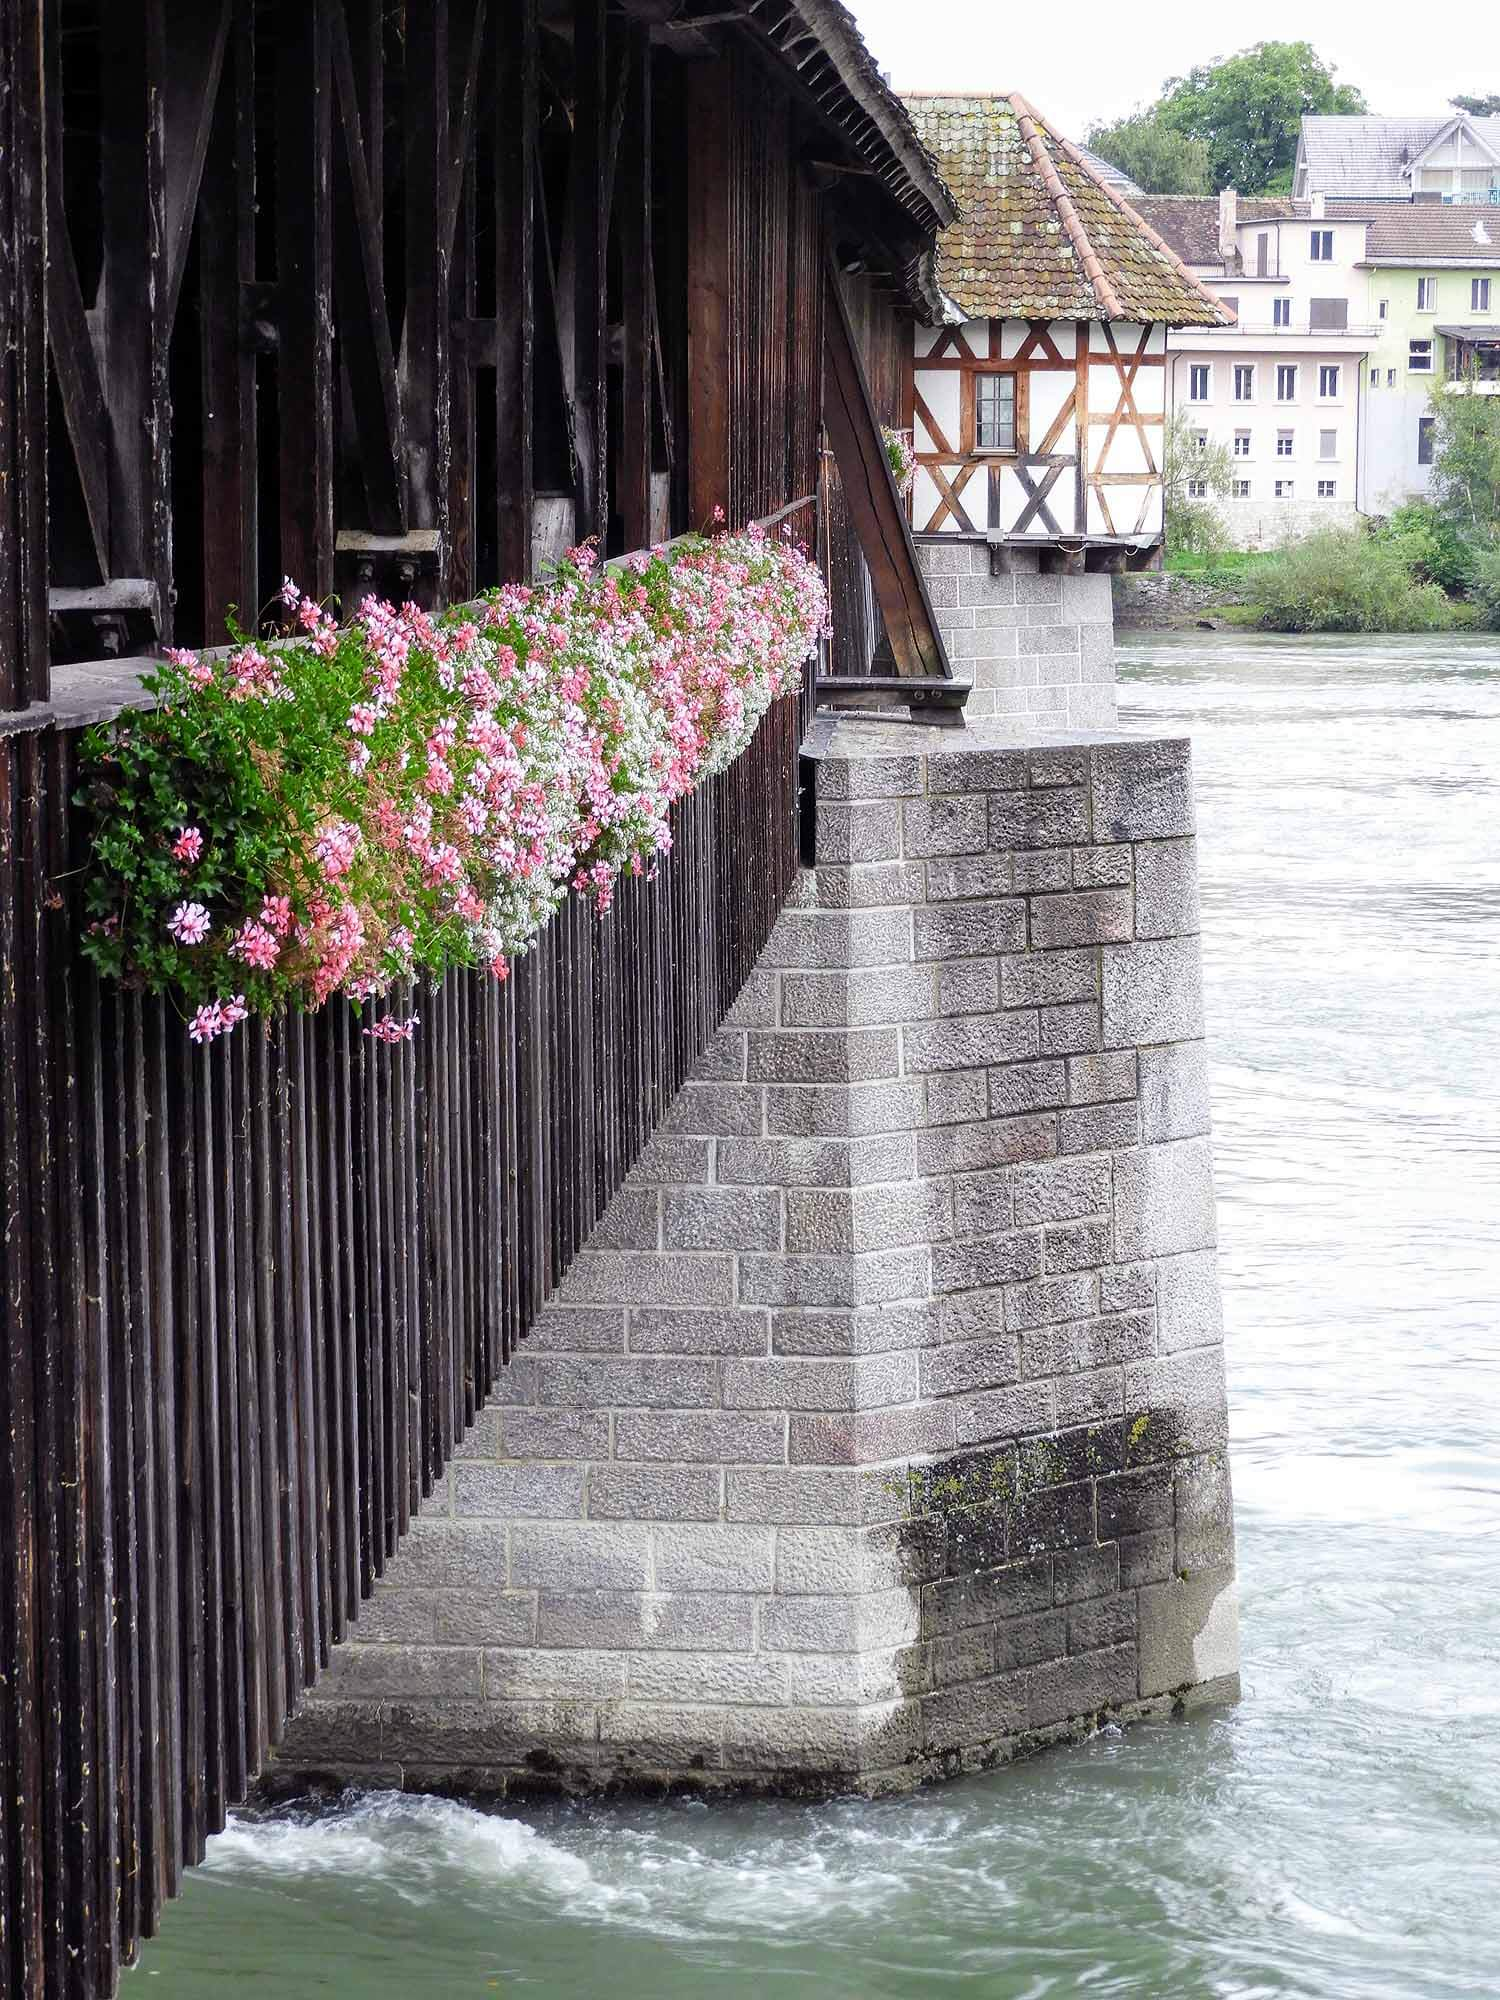 germany-bad-sackingen-rhine-river-historic-bridge-switzerland.jpg